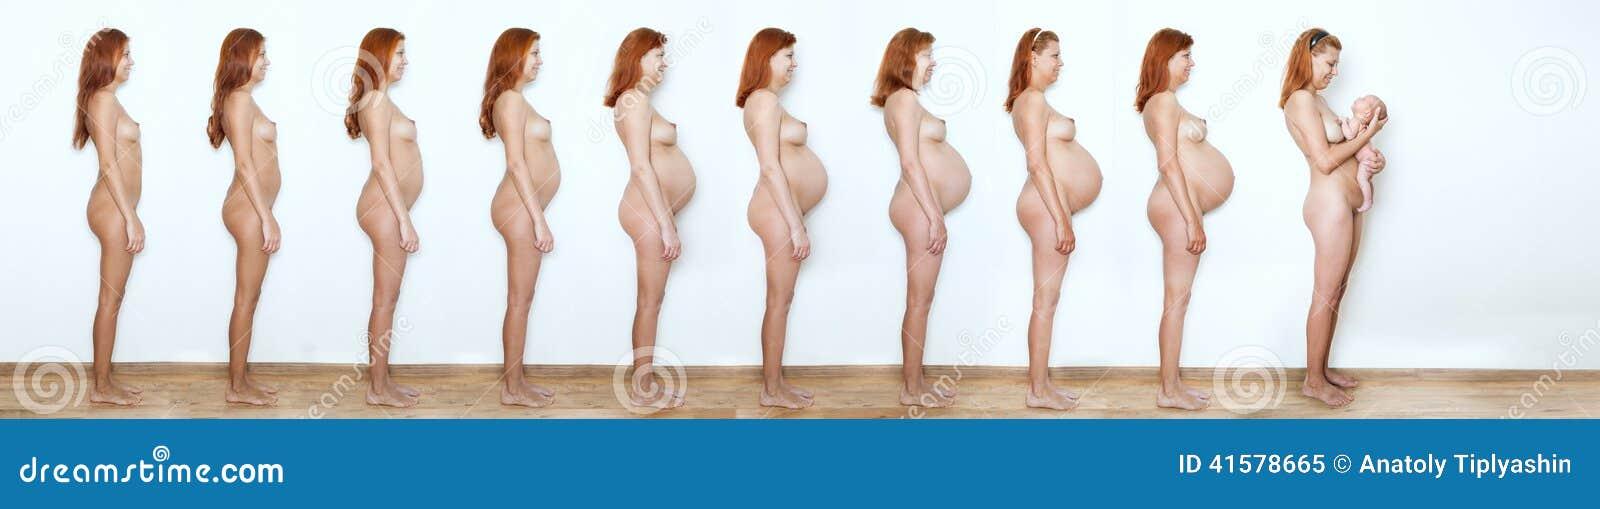 9 month pregnant woman gangbang creampie 2